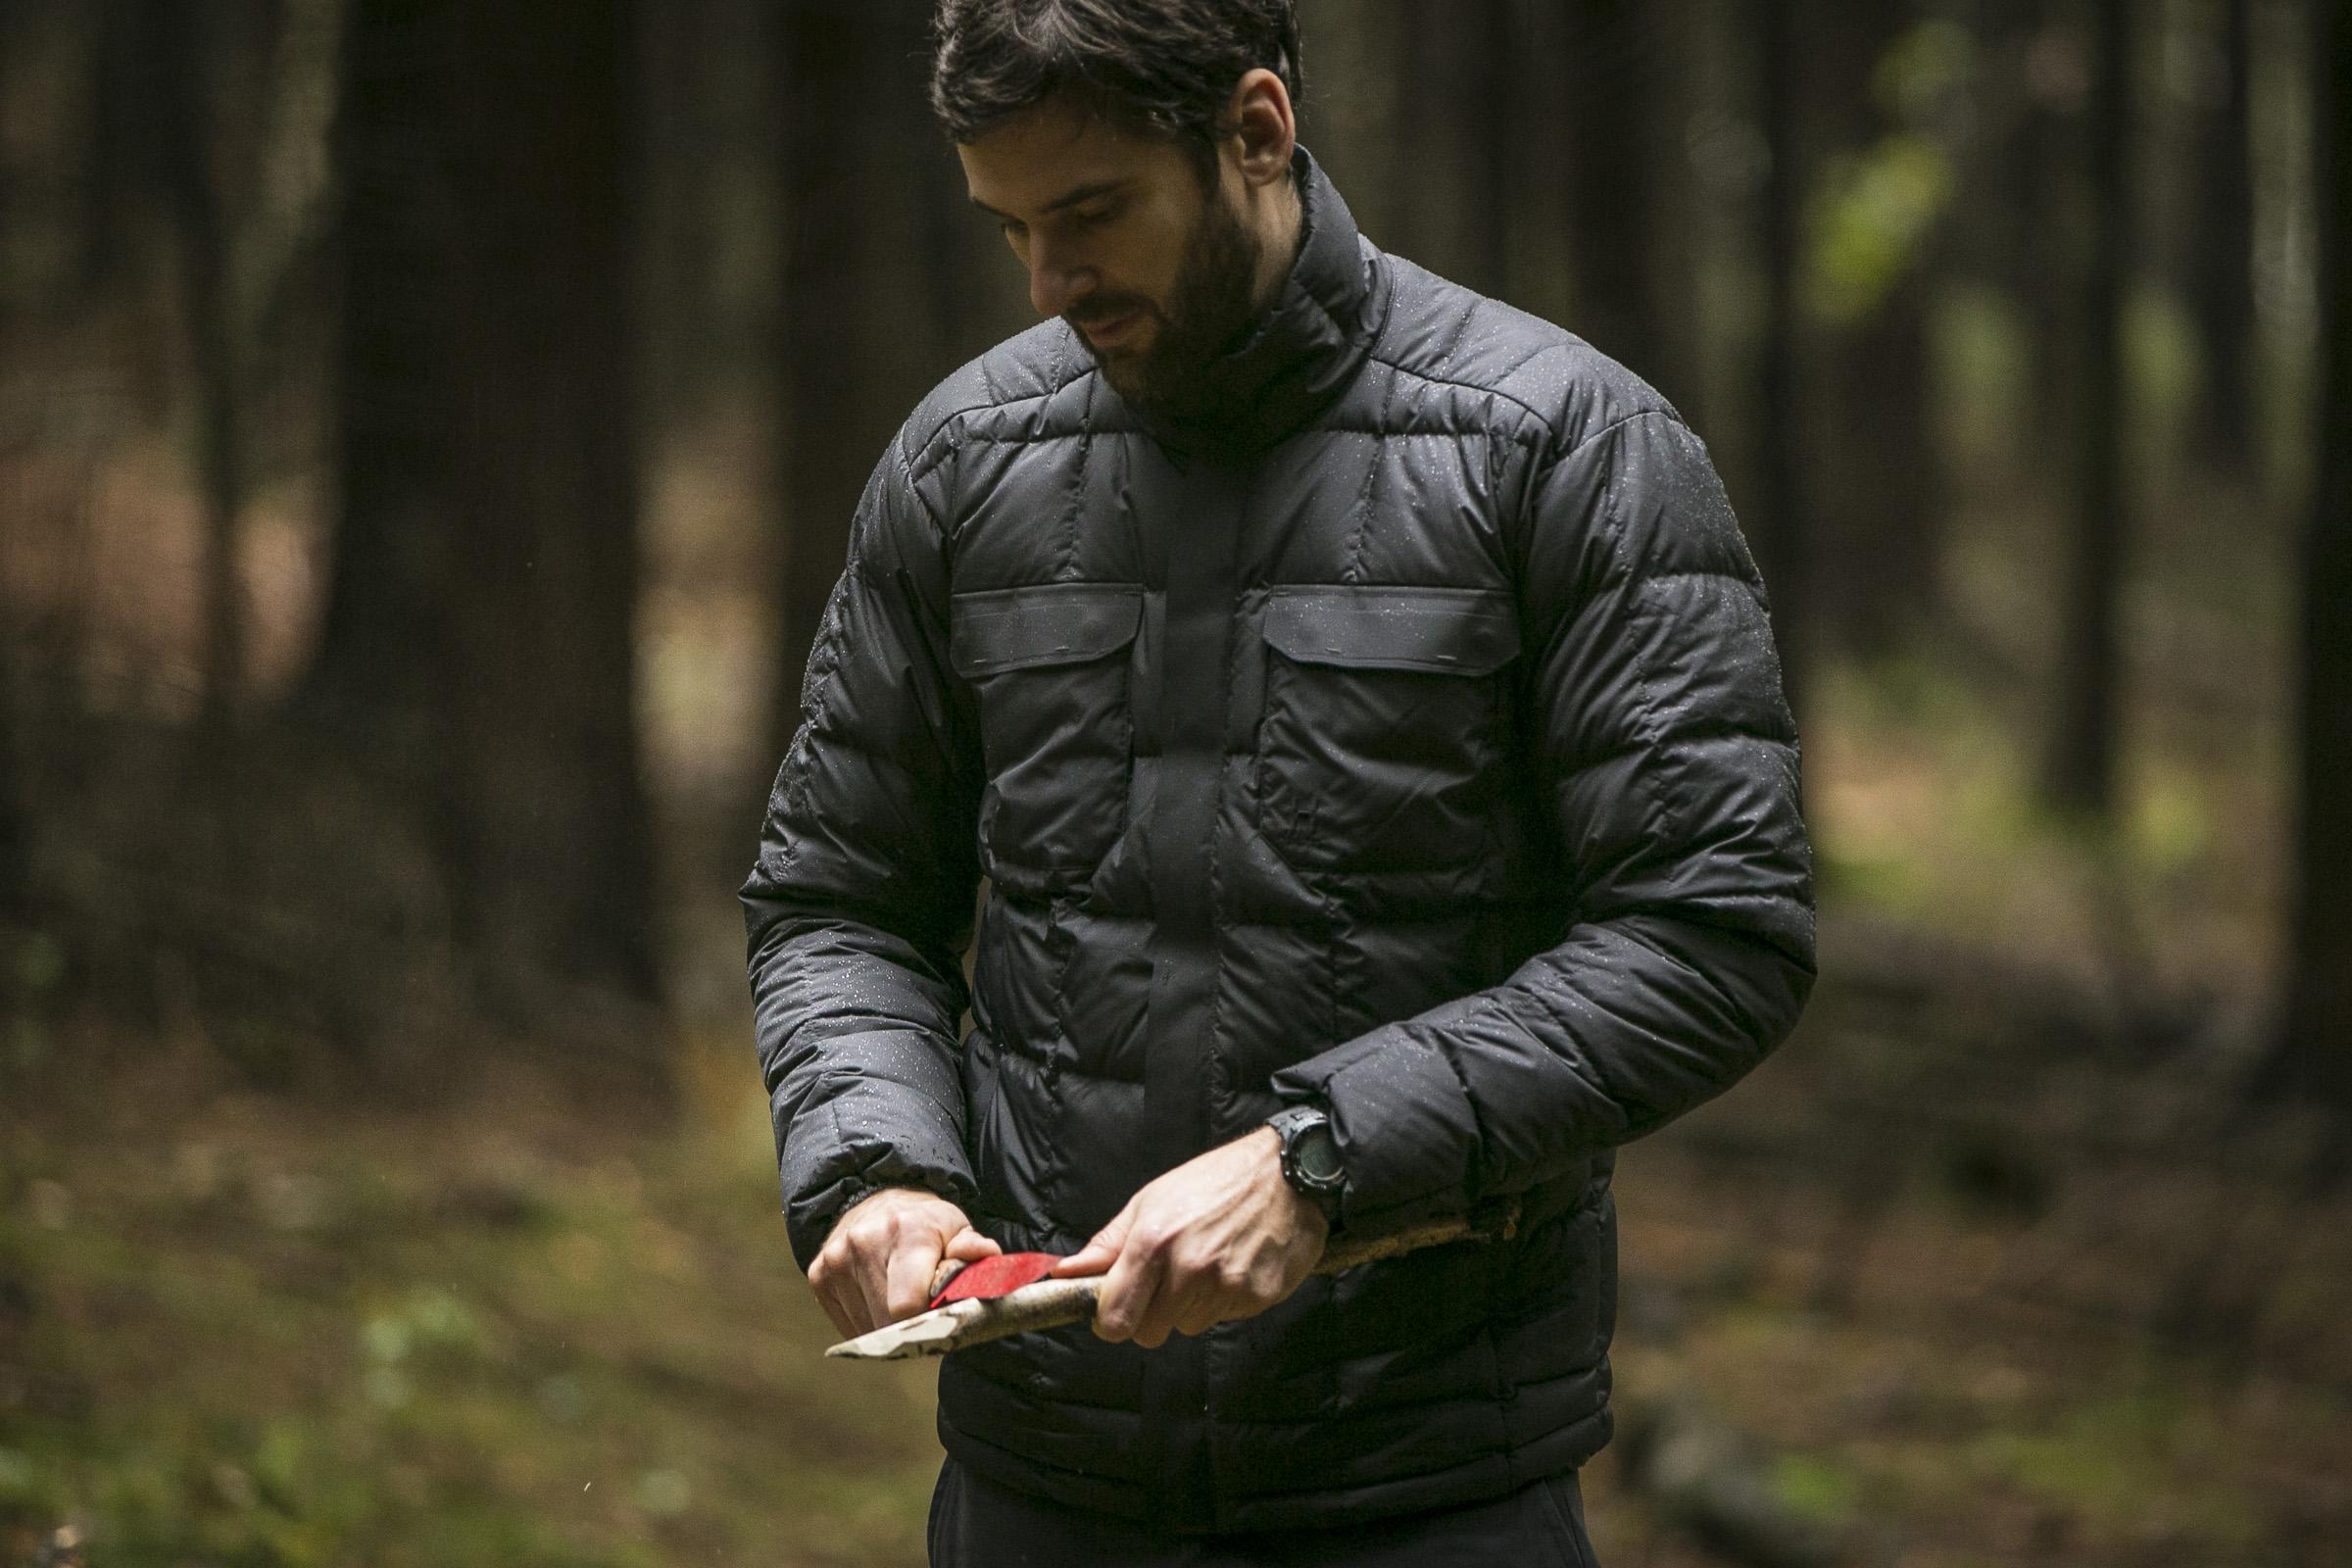 Outdoor Aesthetics | Review: Haglöfs Hede Down Jacket & Siljan Parka